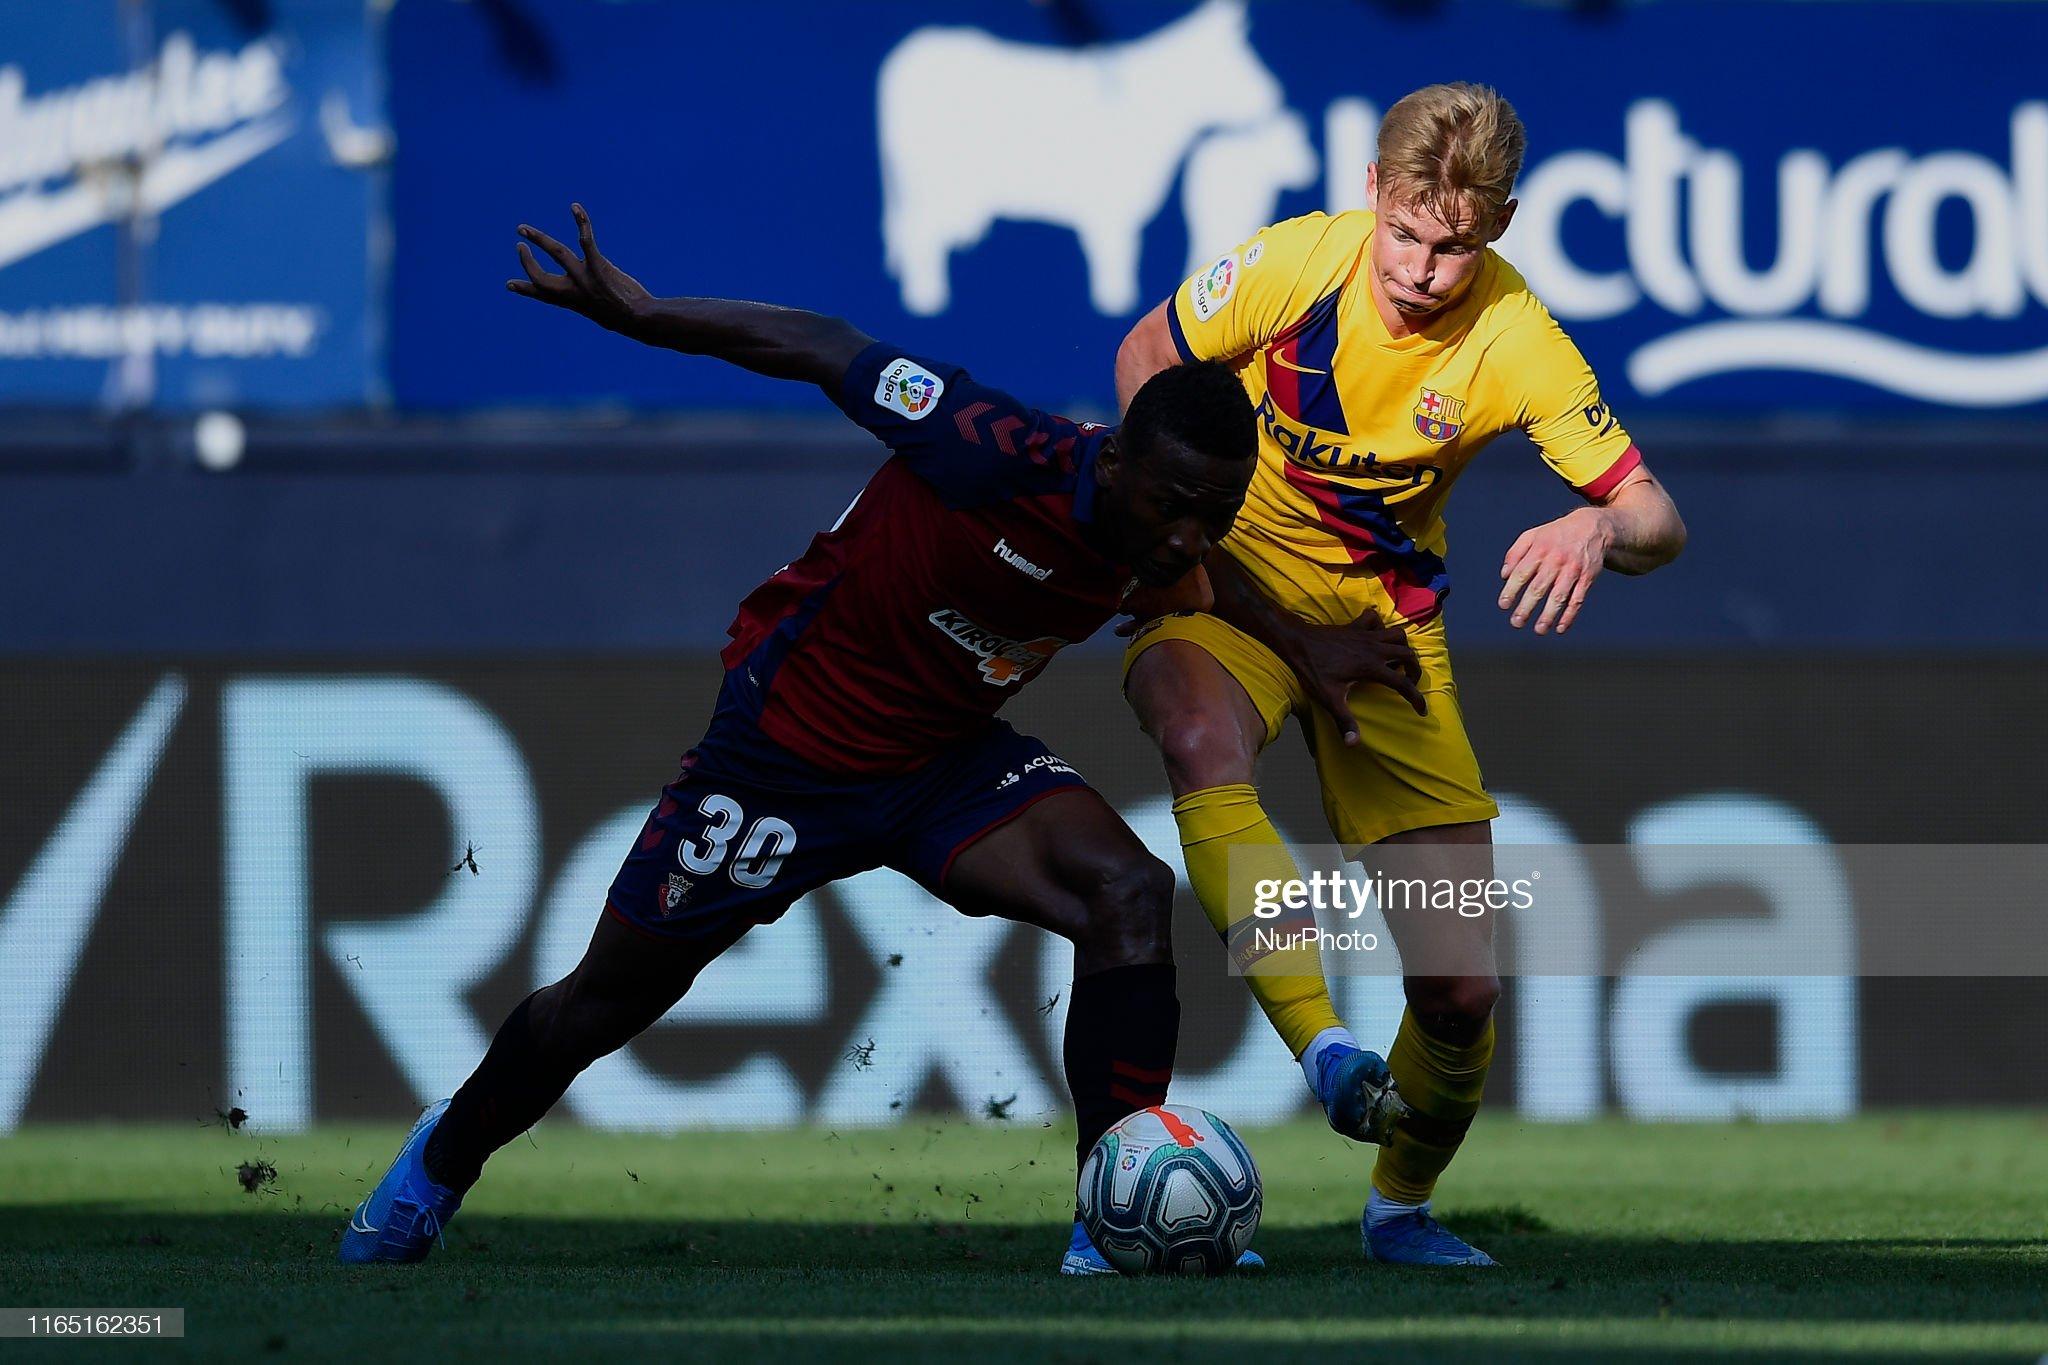 صور مباراة : أوساسونا - برشلونة 2-2 ( 31-08-2019 )  Frenkie-de-jong-of-barcelona-and-pervis-estupinan-of-osasuna-competes-picture-id1165162351?s=2048x2048